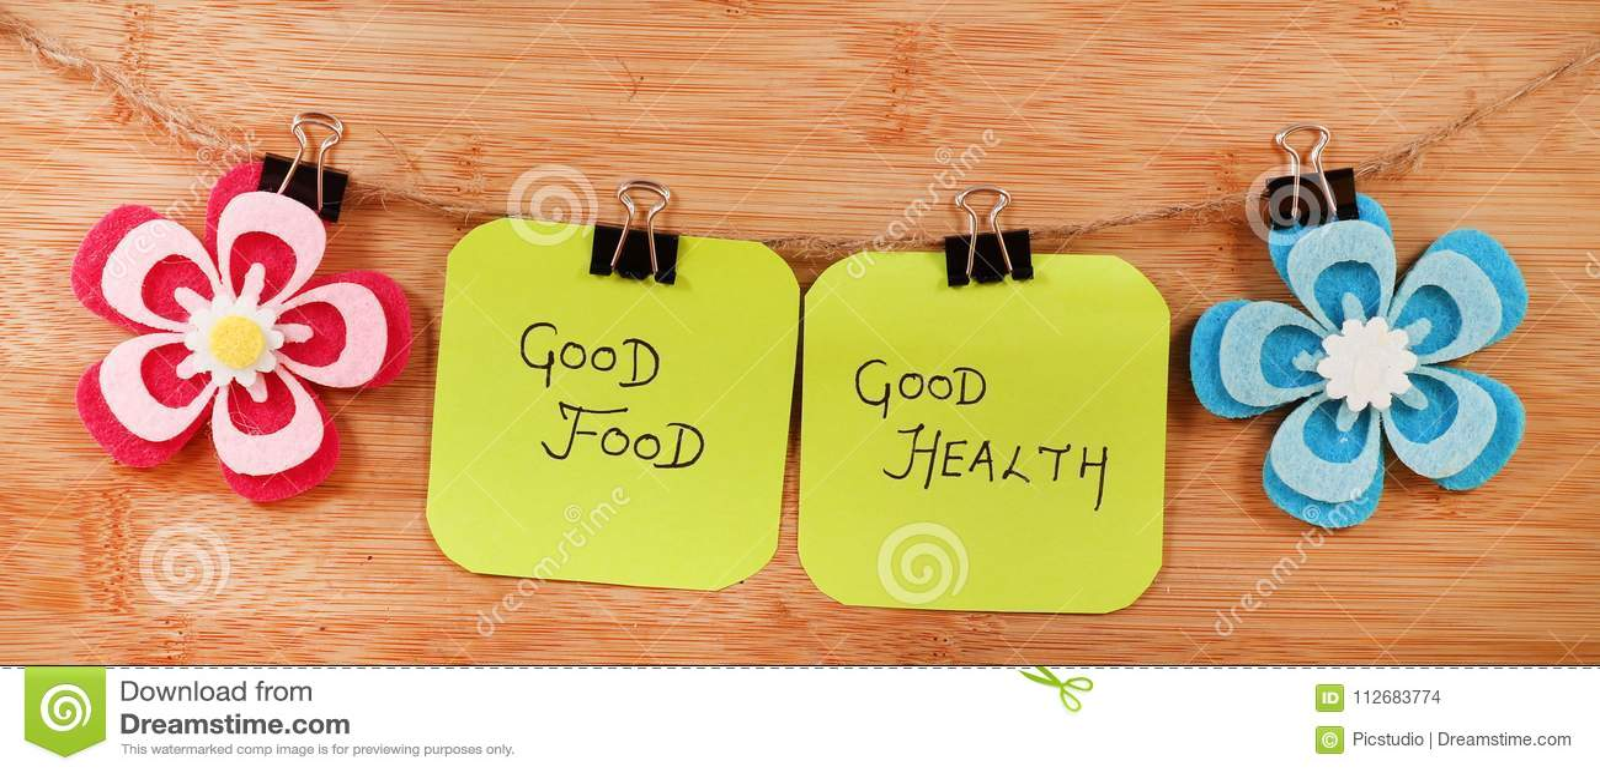 Positives Zitat